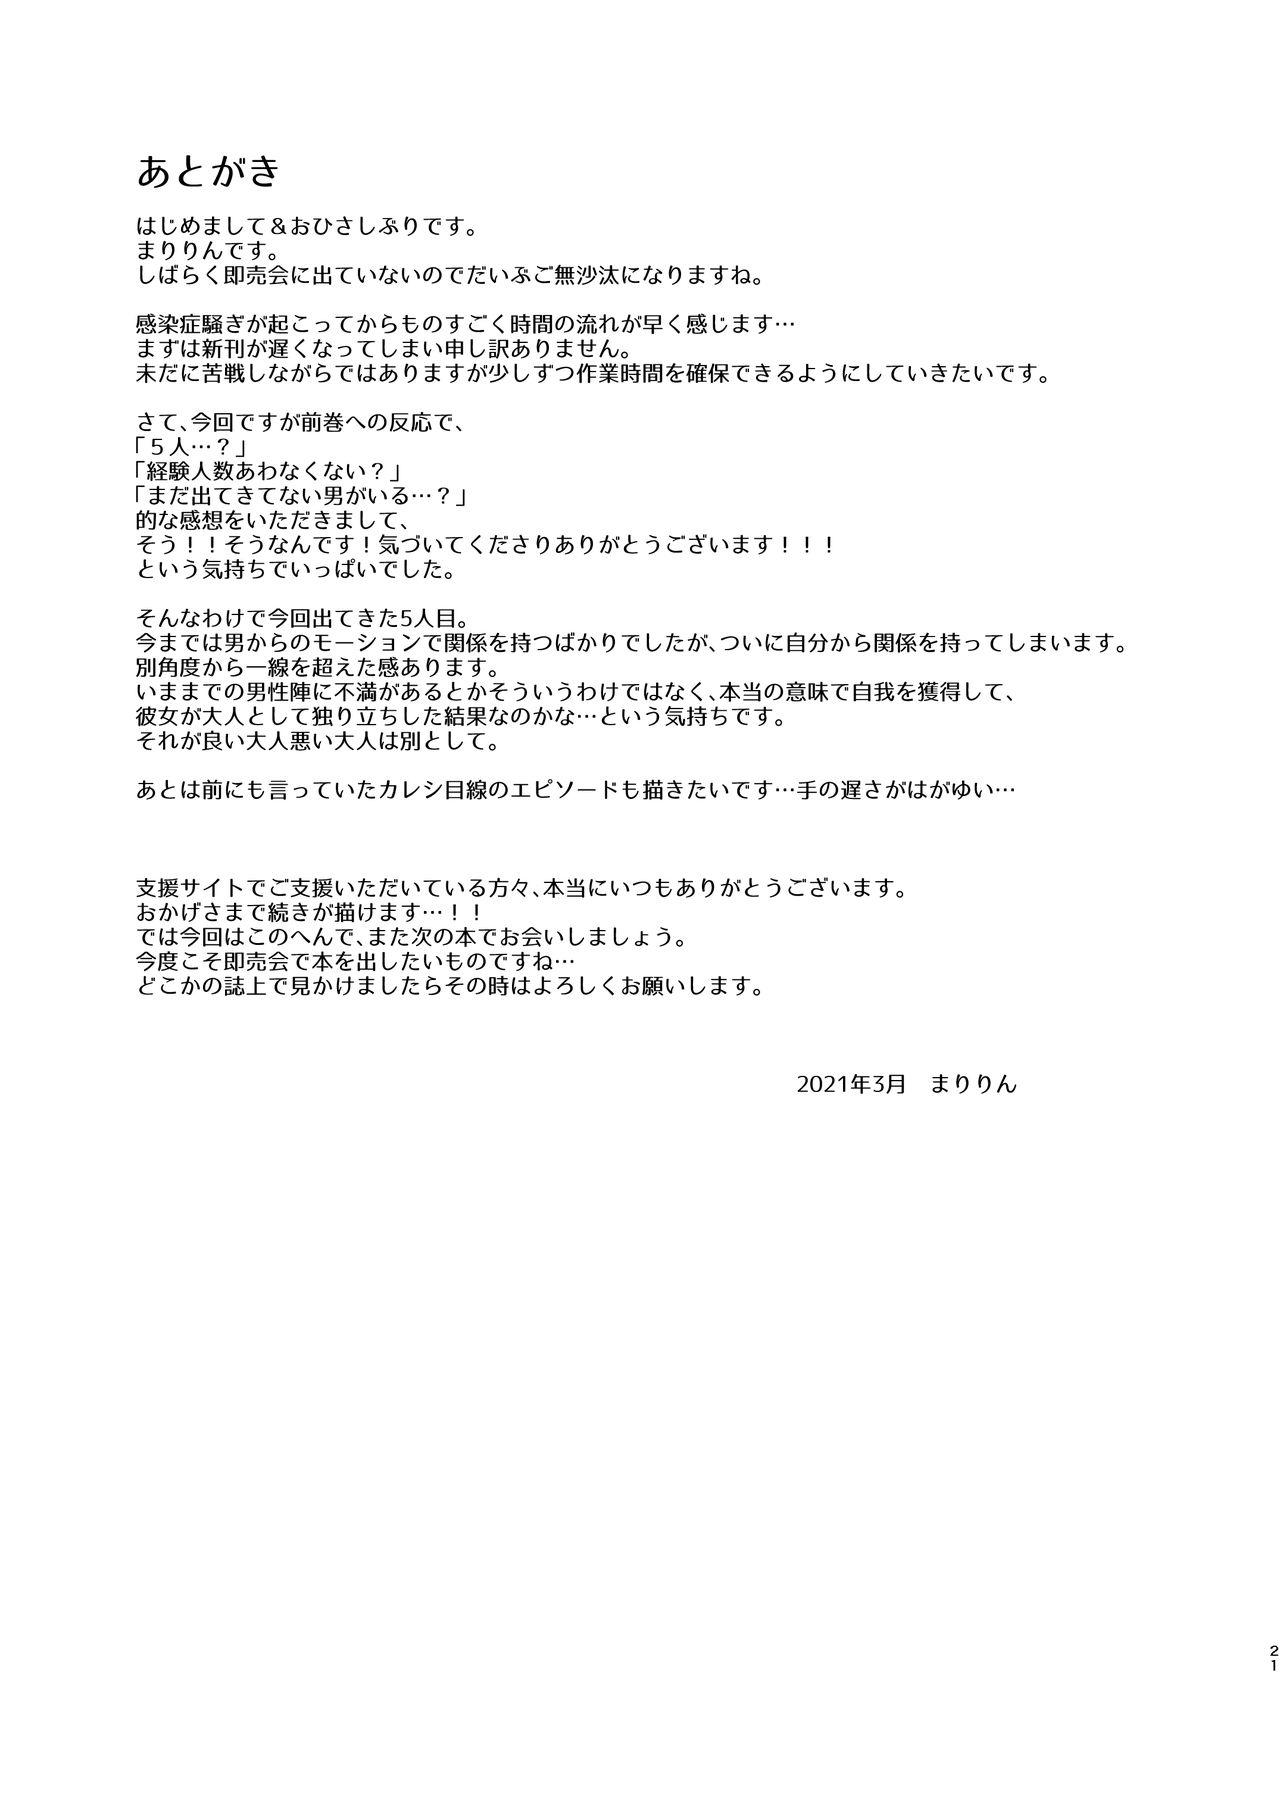 Cosplay x Keiken Ninzuu 21